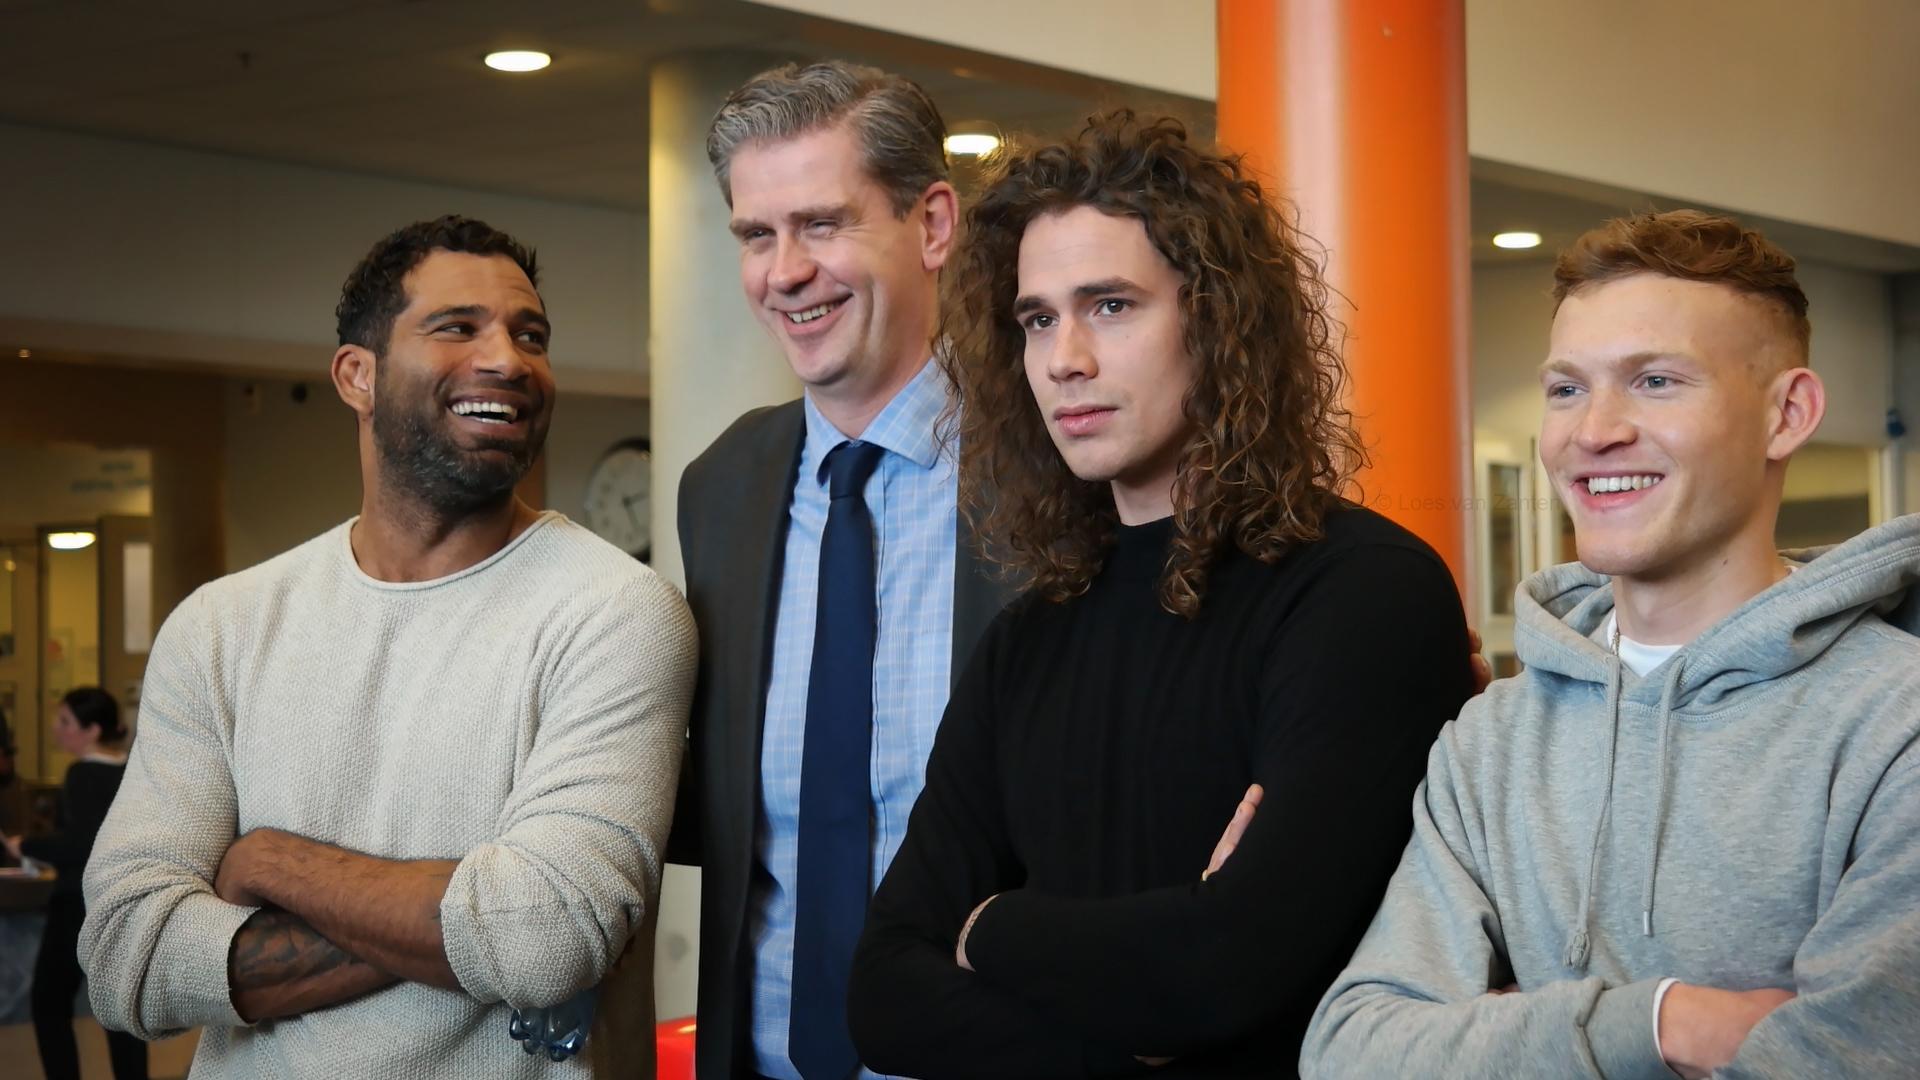 The Passion 2019 Dordrecht - Edwin Jonkers (Jezus), Burgemeester Wouter Kolff, Lucas Hamming (Judas) en Paul Sinha (Petrus) - indebuurt Dordrecht